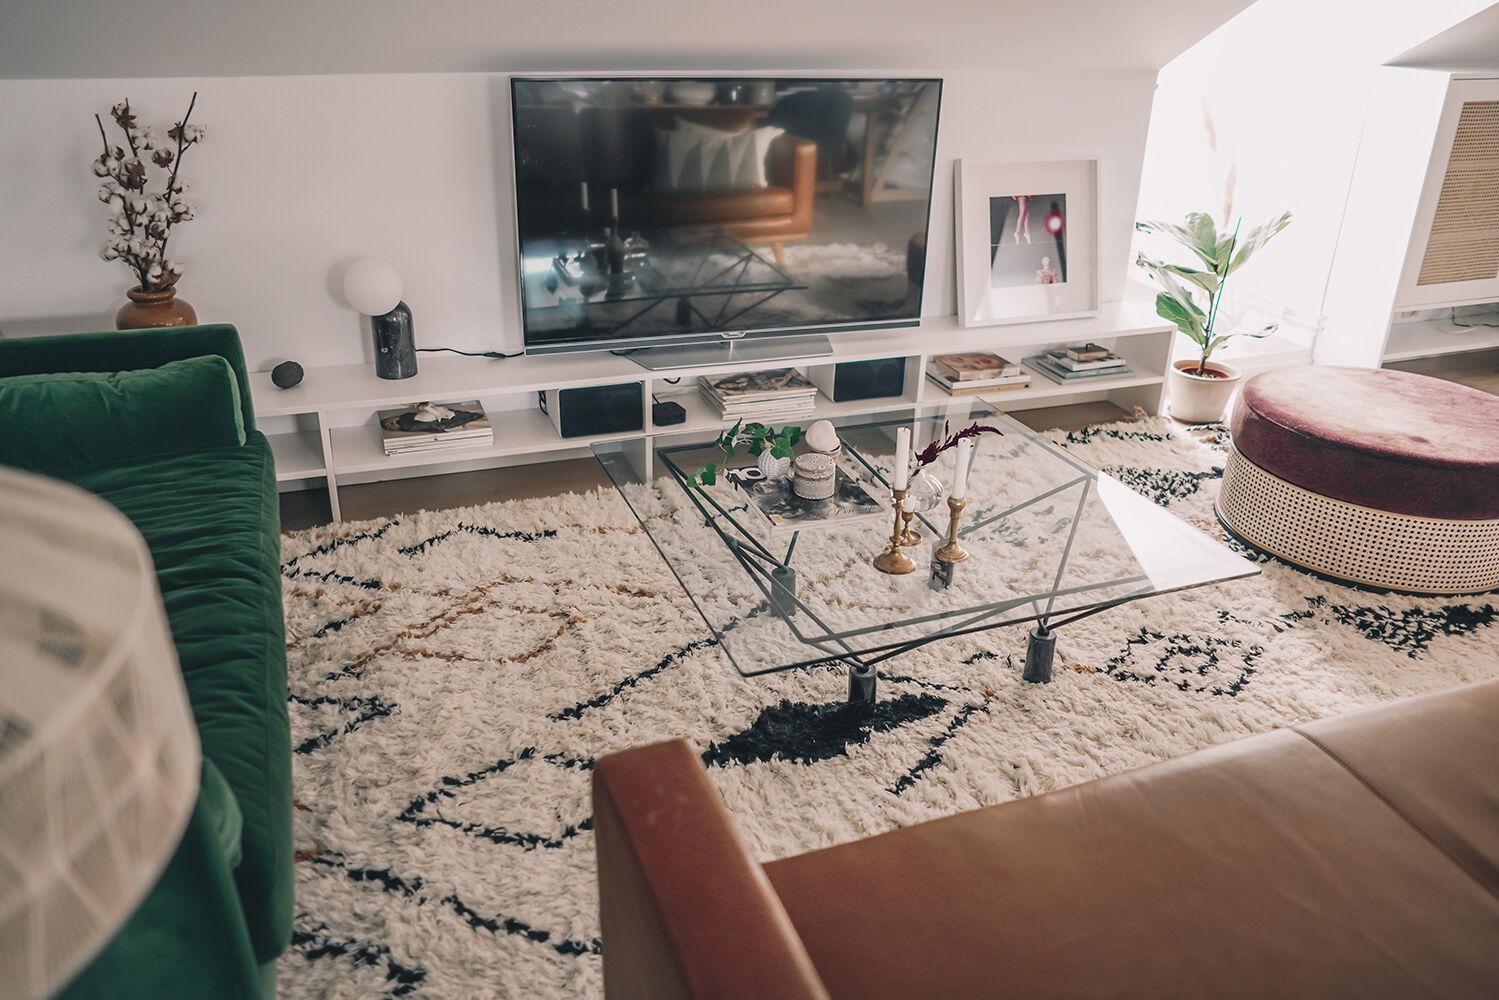 vanja wikström vardagsrum layered matta inredningsinspo